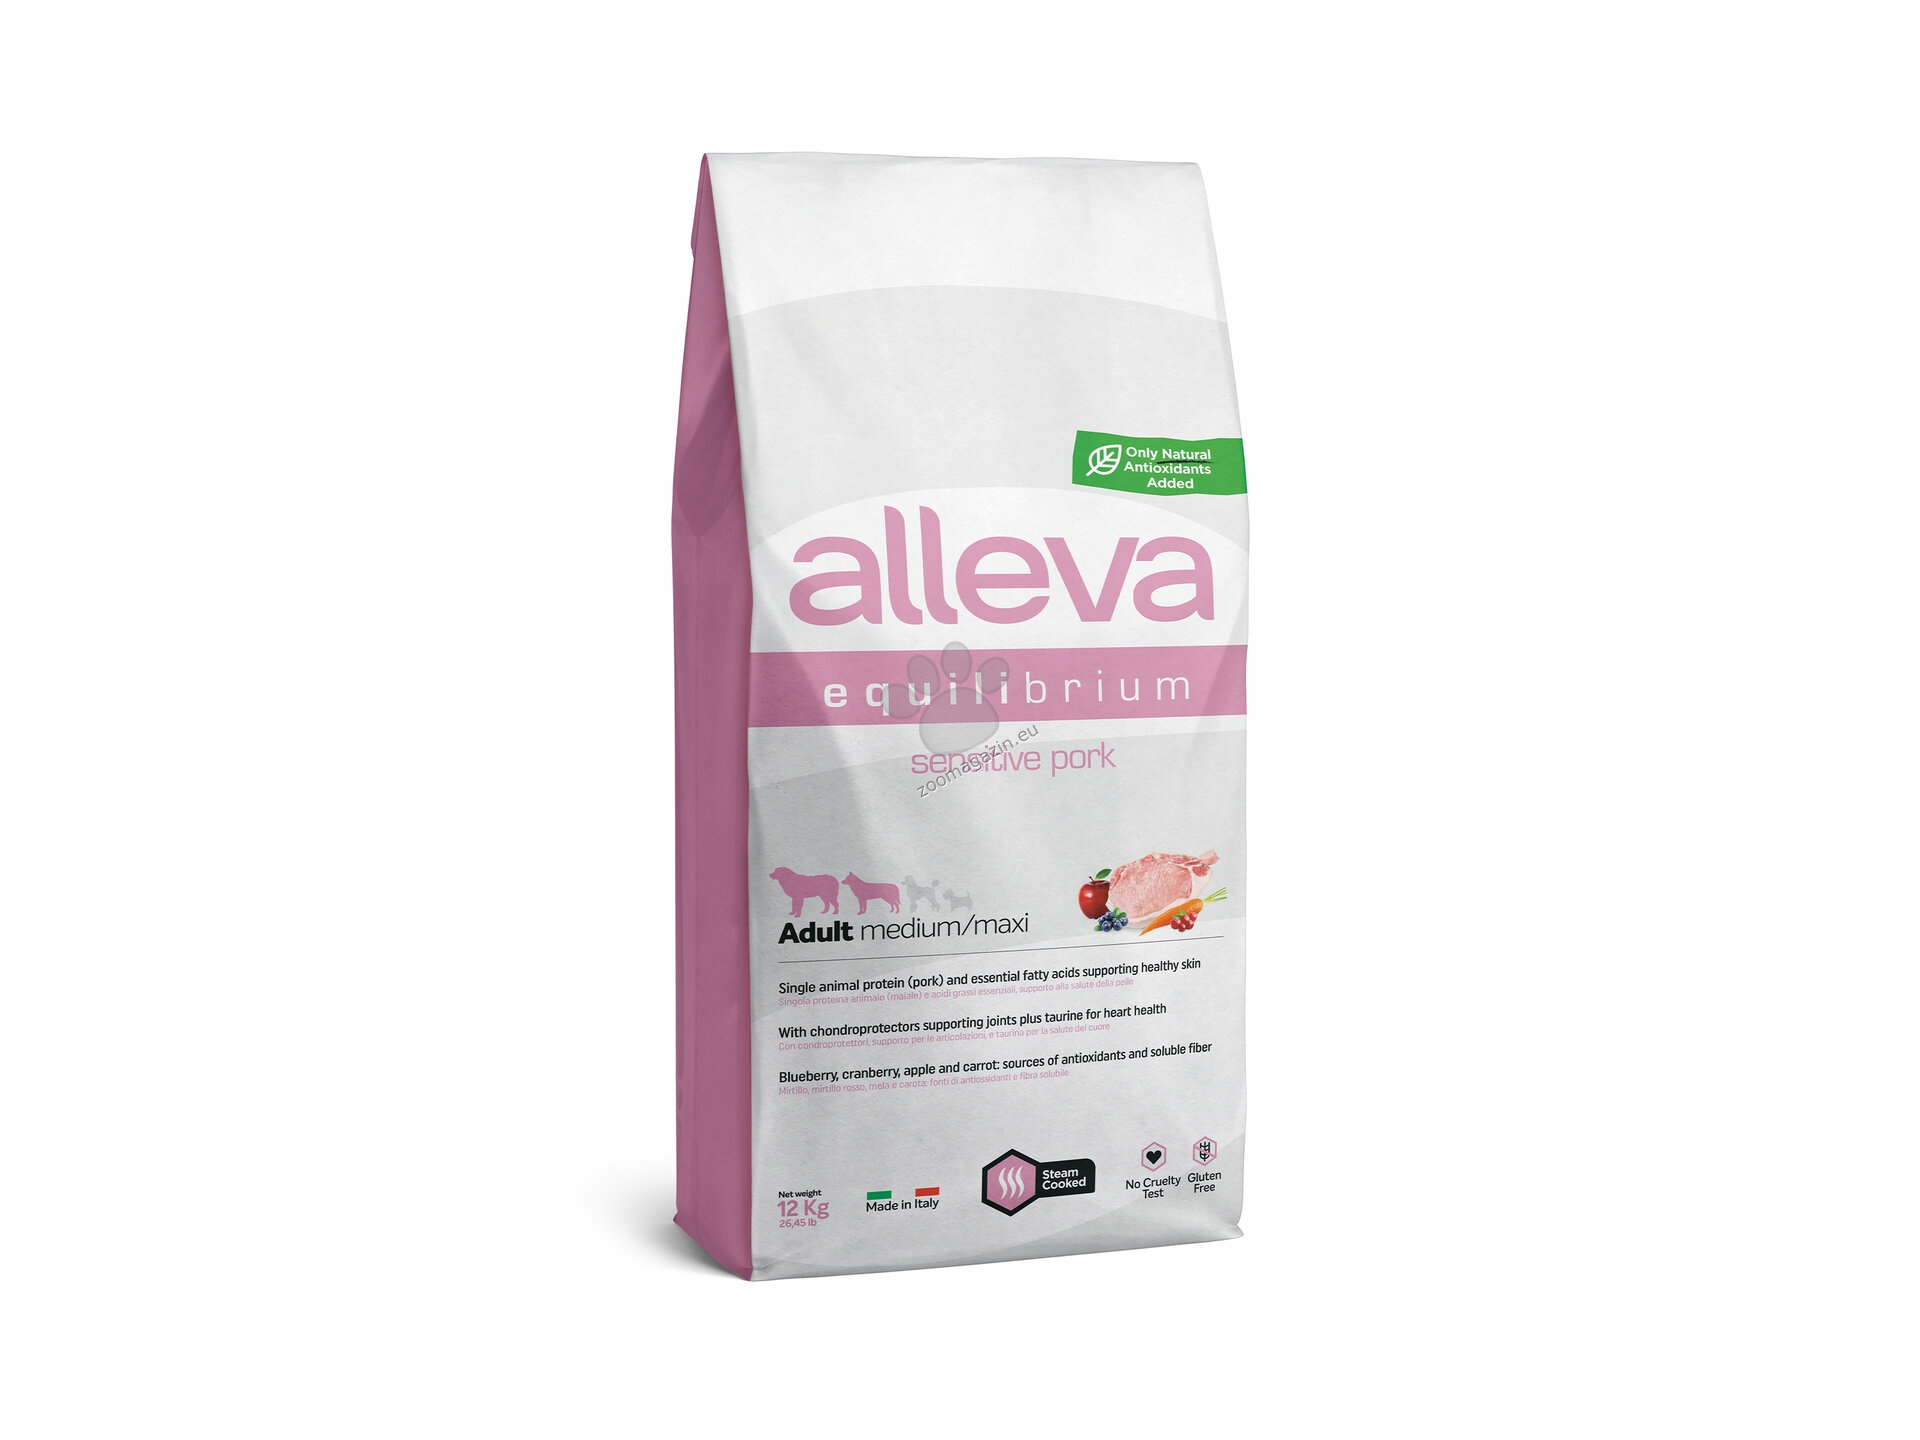 Alleva Equilibrium Sensitive Pork Adult Medium/Maxi - със свинско, за кучета средни /10-25 кг. / и големи / над 25 кг. / породи и възраст над 12 месеца 12 кг.